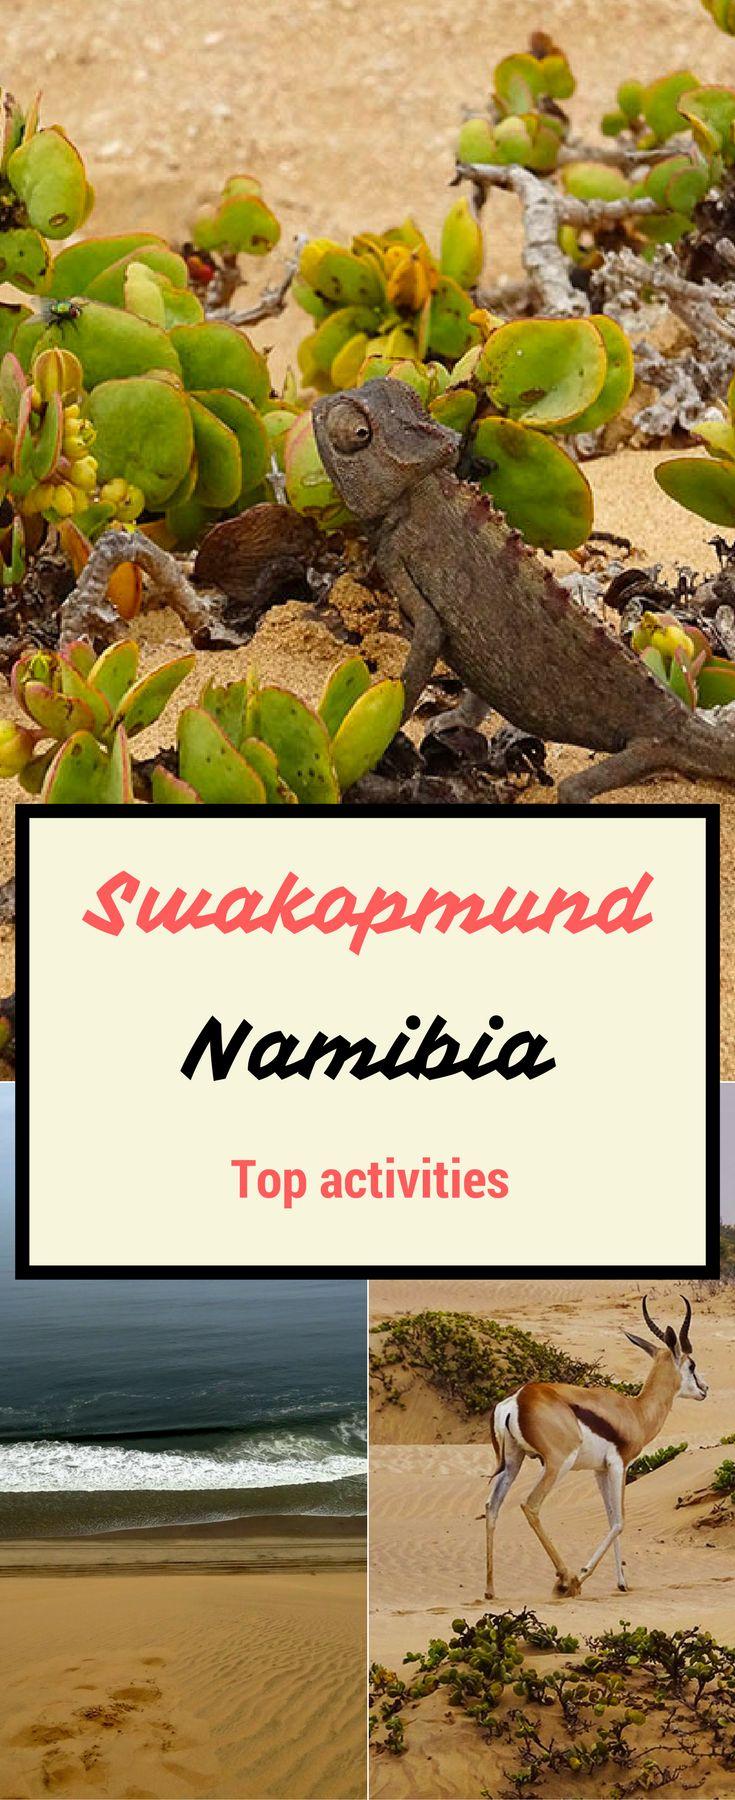 Guide tour to Swakopmund | Viste Namibia | Top things to do in Namibia | things to do in Swakopmund